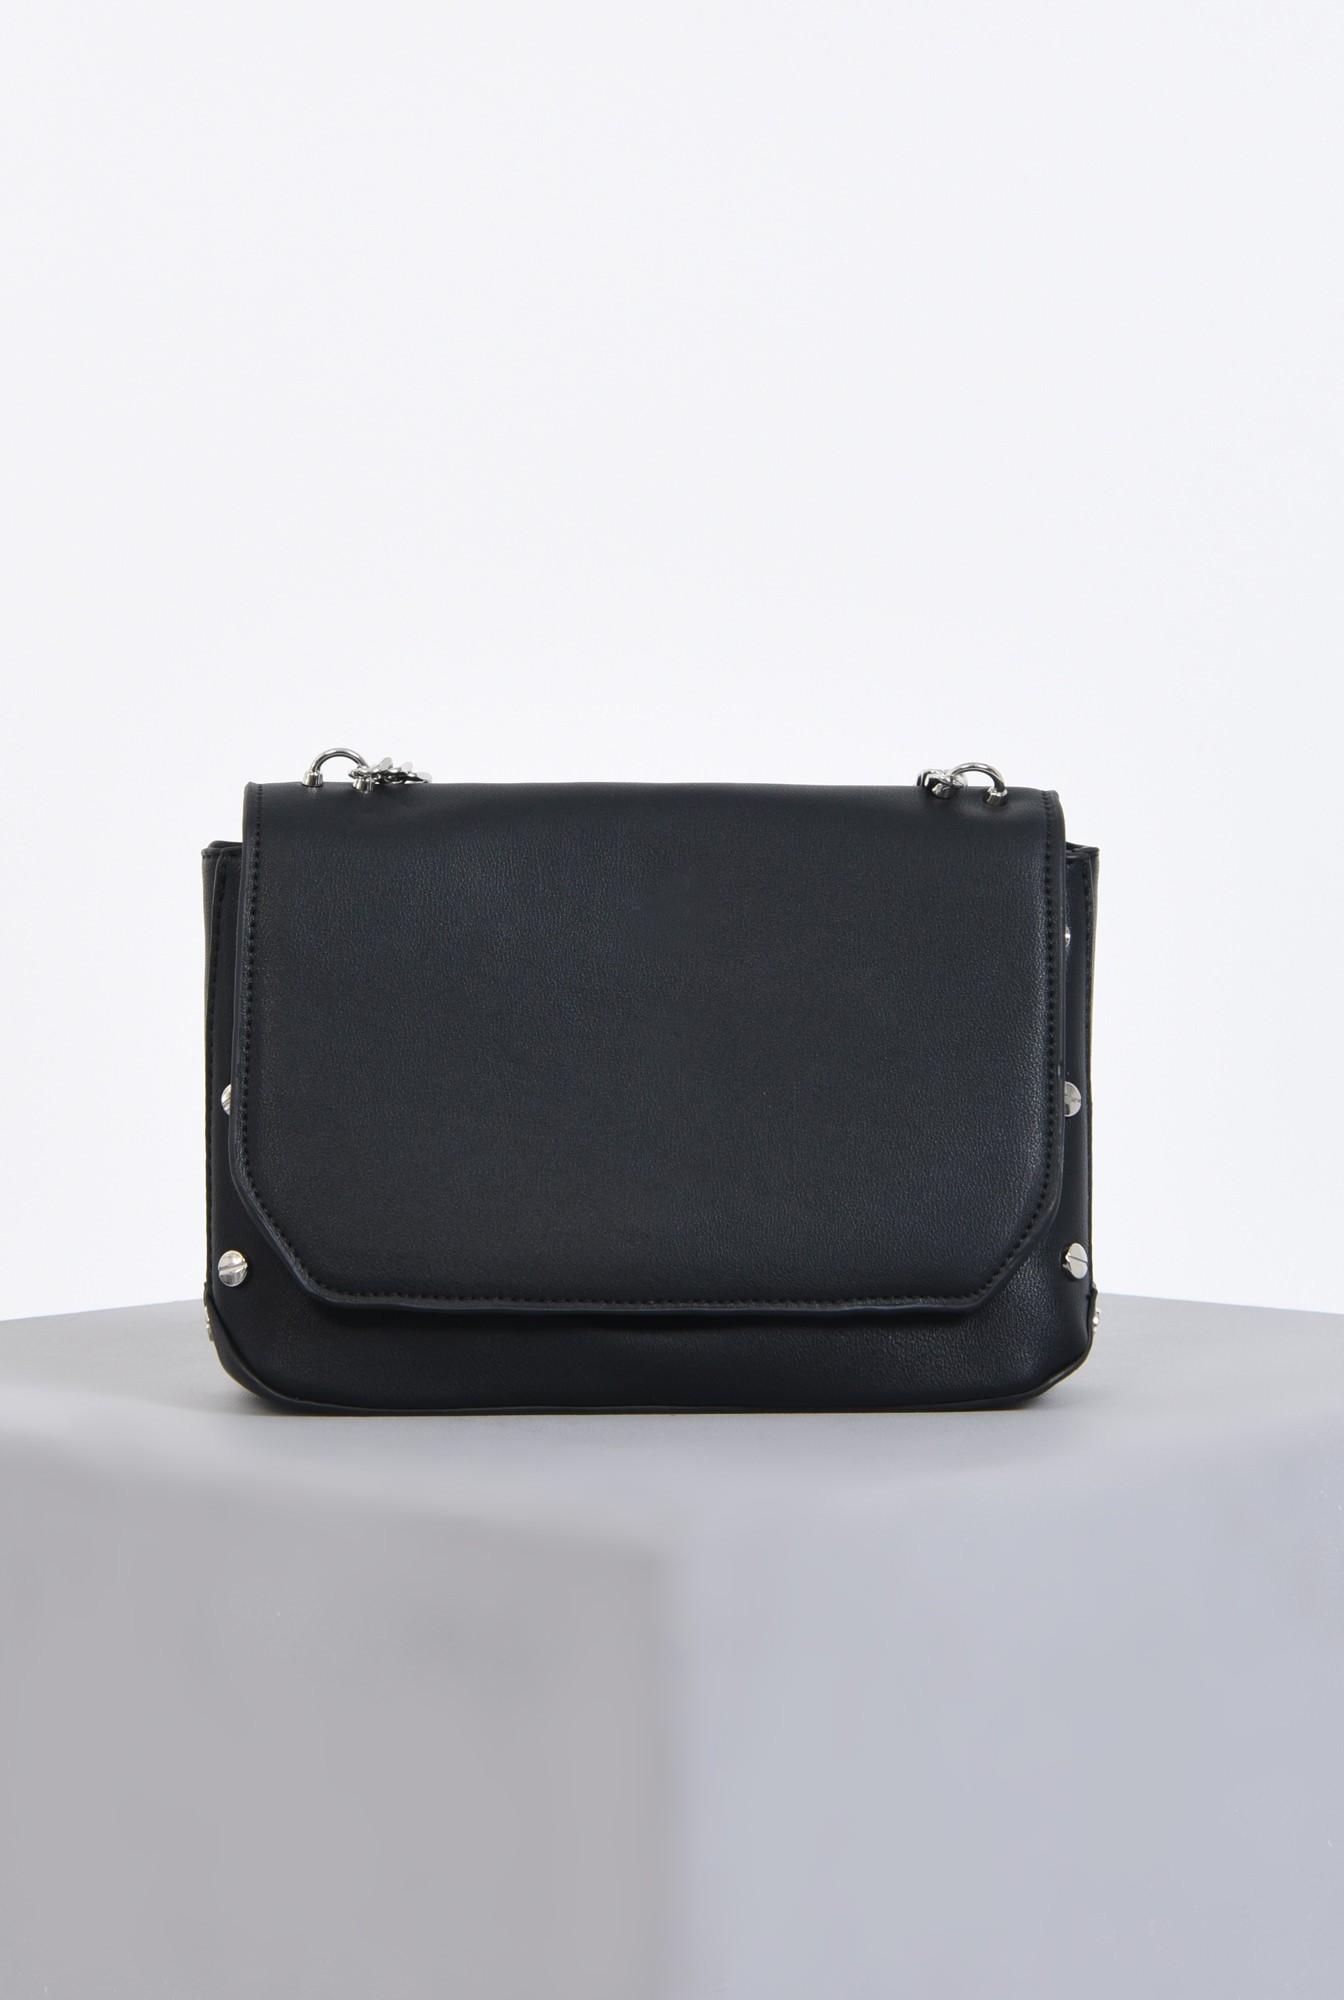 0 - geanta casual, negru, lant, argintiu